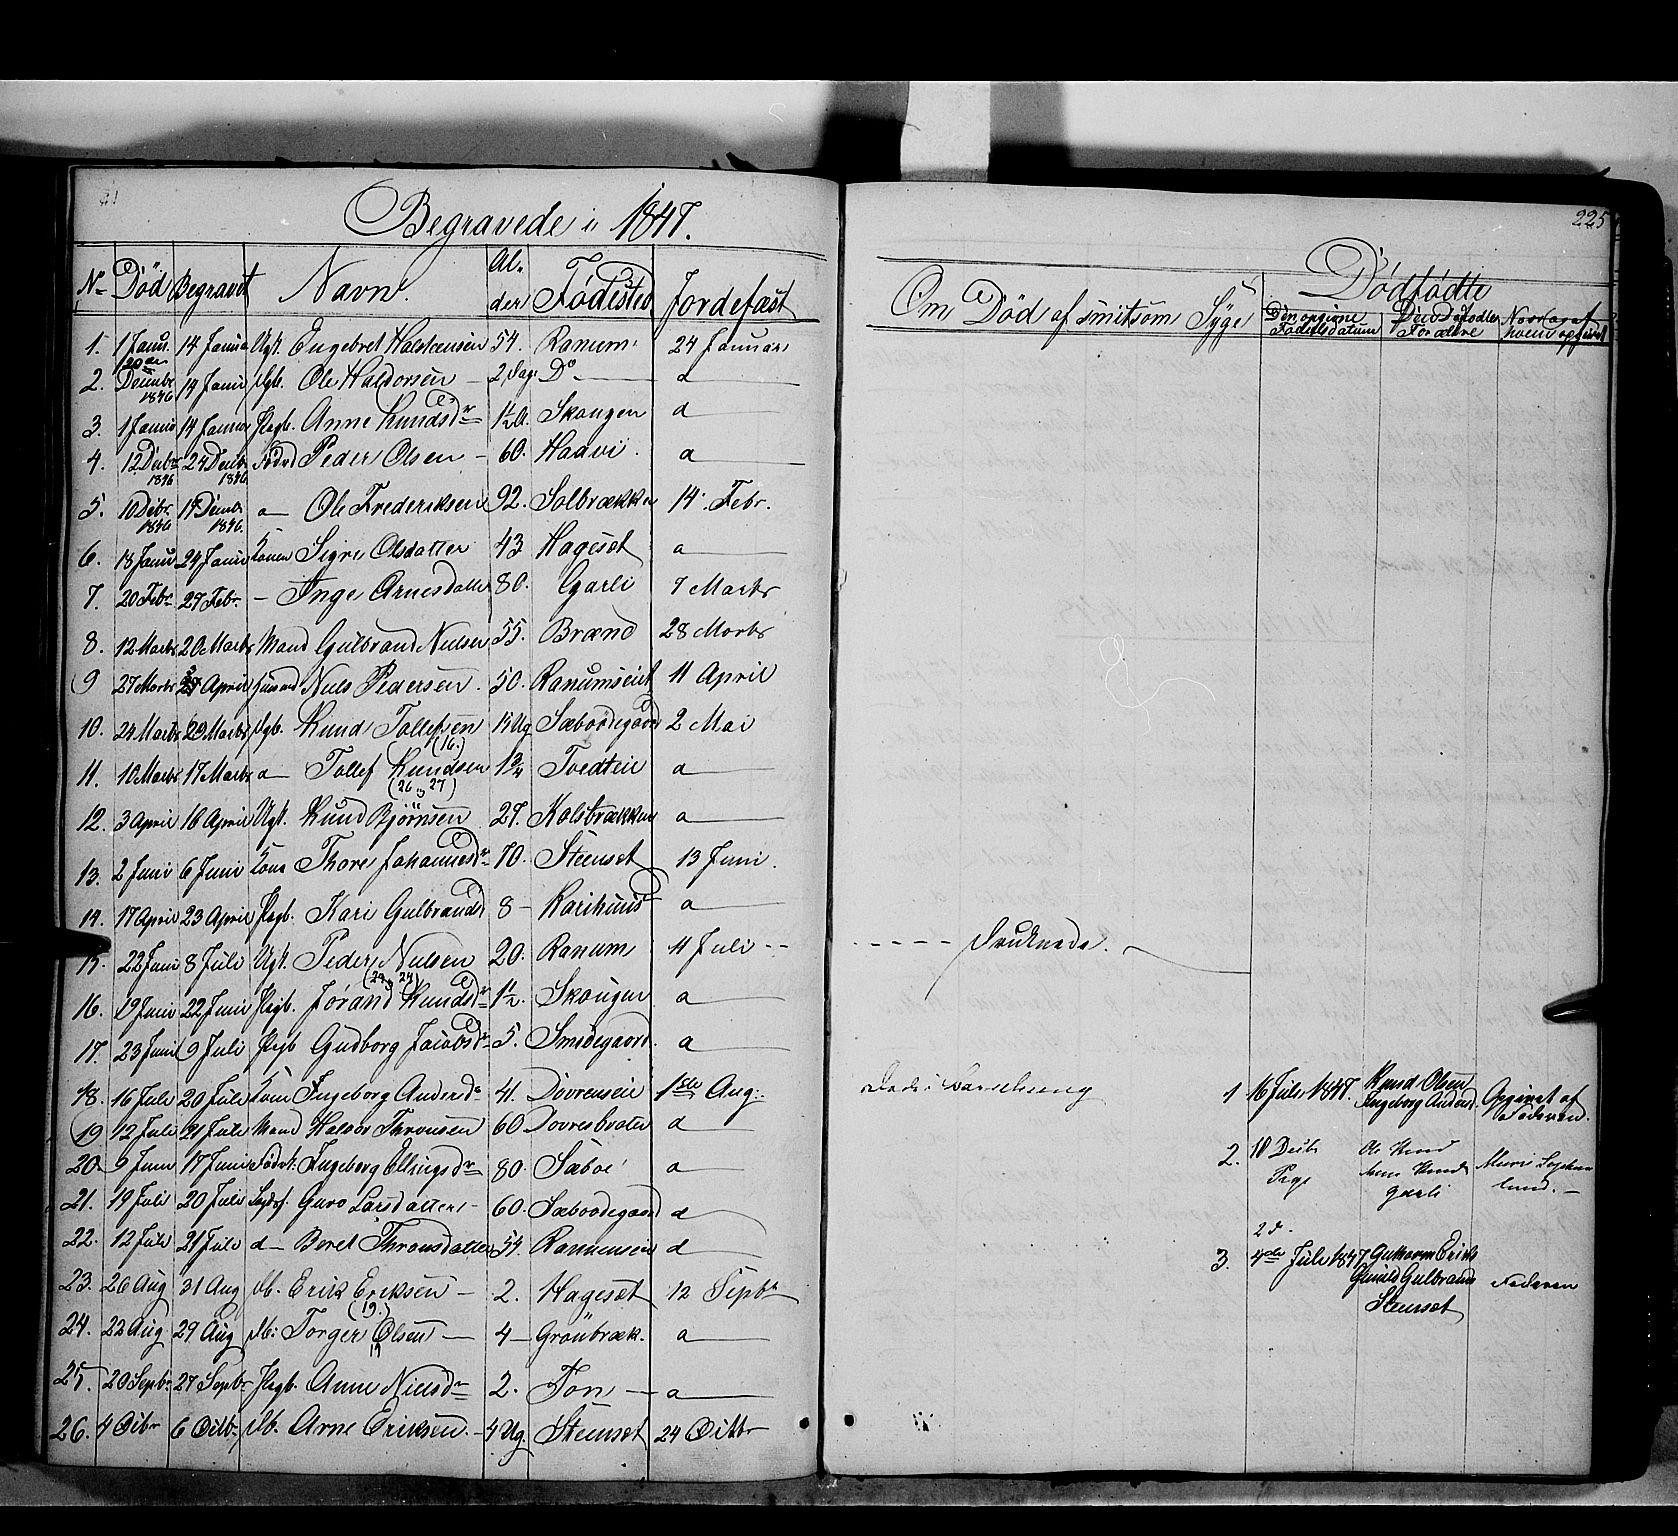 SAH, Nord-Aurdal prestekontor, Ministerialbok nr. 7, 1842-1863, s. 225